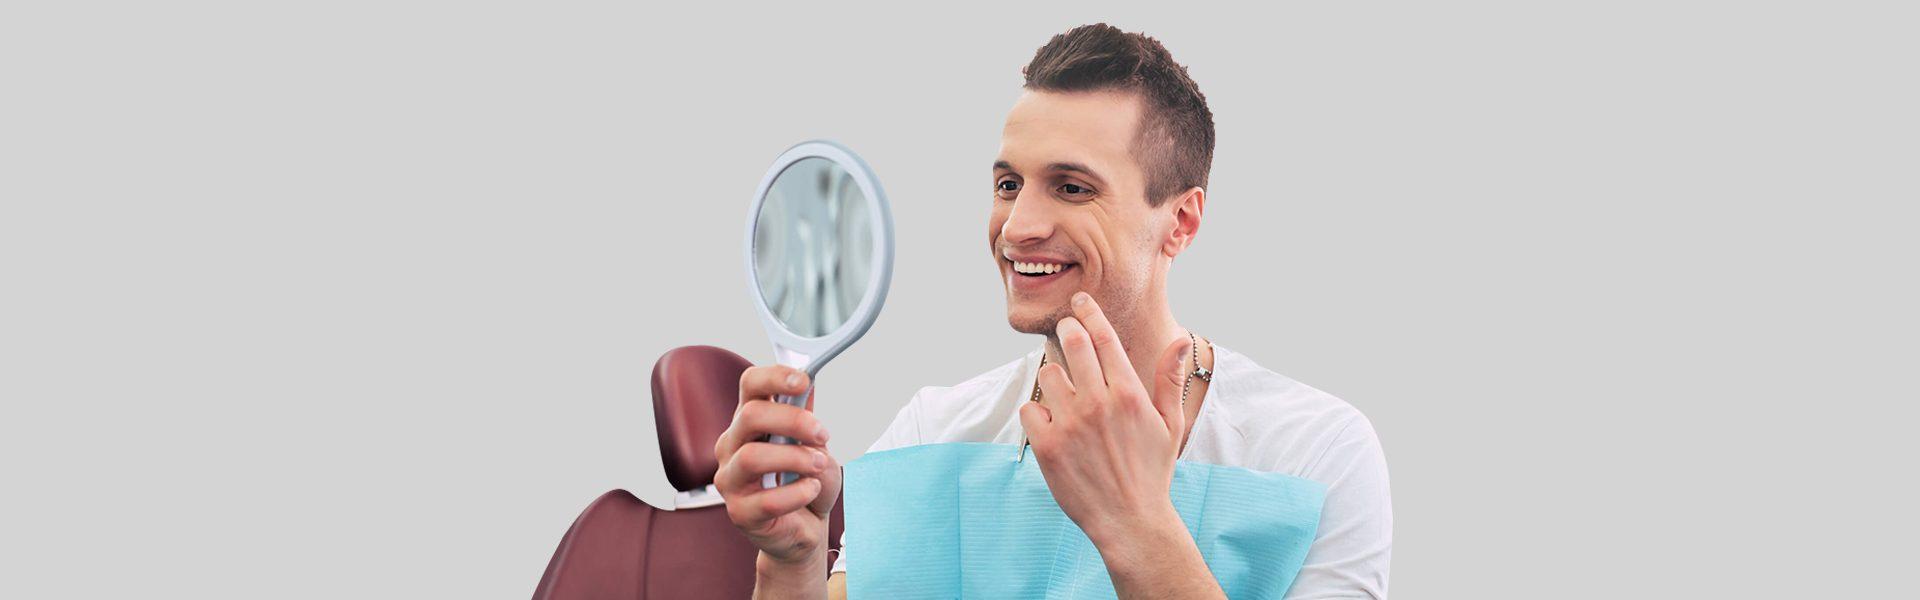 Family Dentistry: 4 Basic Dental Procedures Plus Benefits